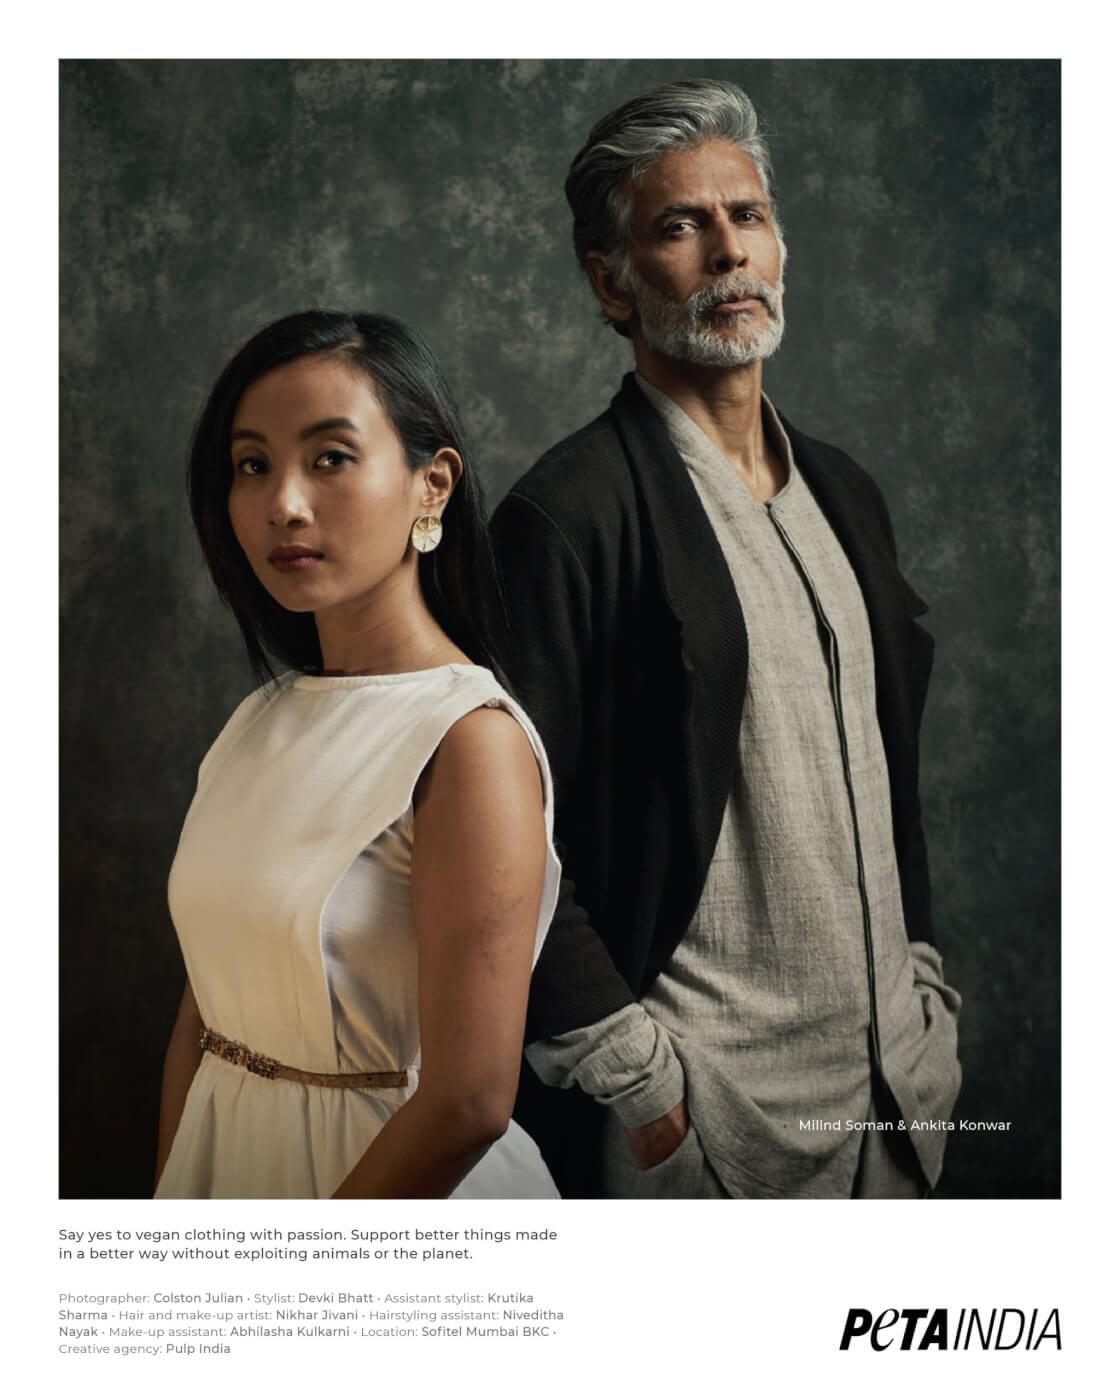 Milind Soman and Ankita Konwar Vegan Fashion Look book 2021 - Office Wear